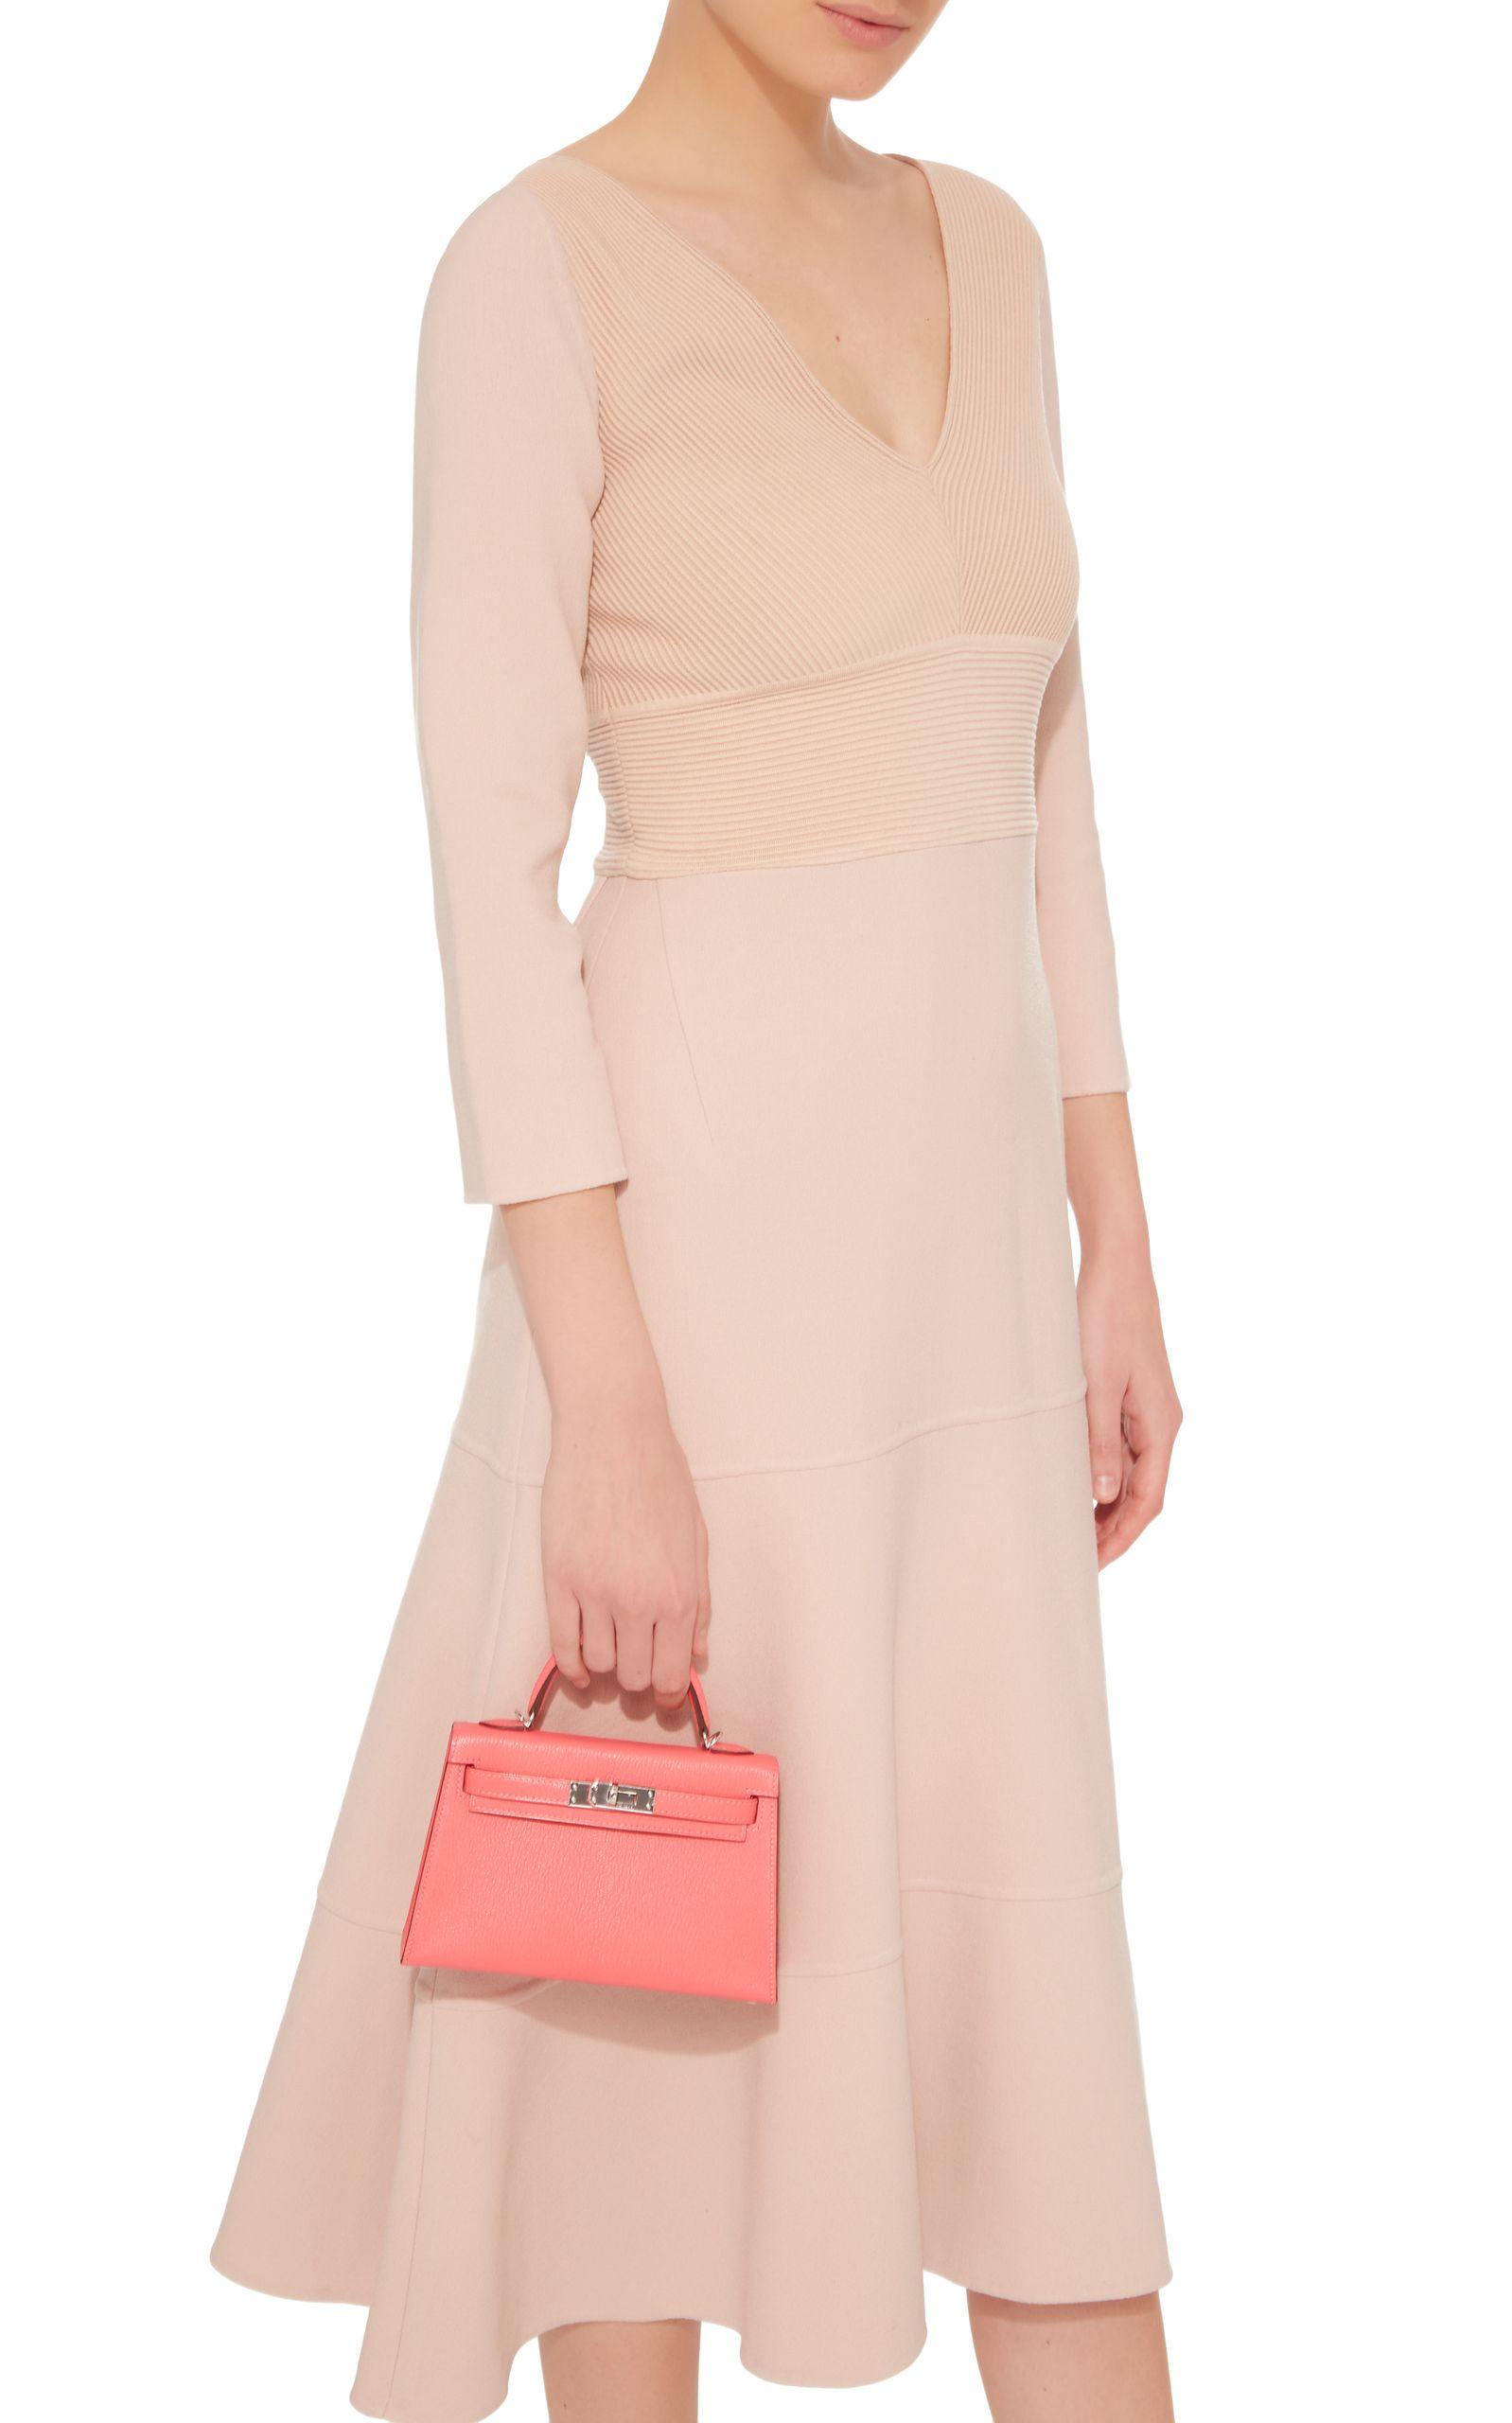 b930c8af1e68 Hermès 20Cm Rose Azalee Chevre Leather Sellier Mini Kelly CA 24